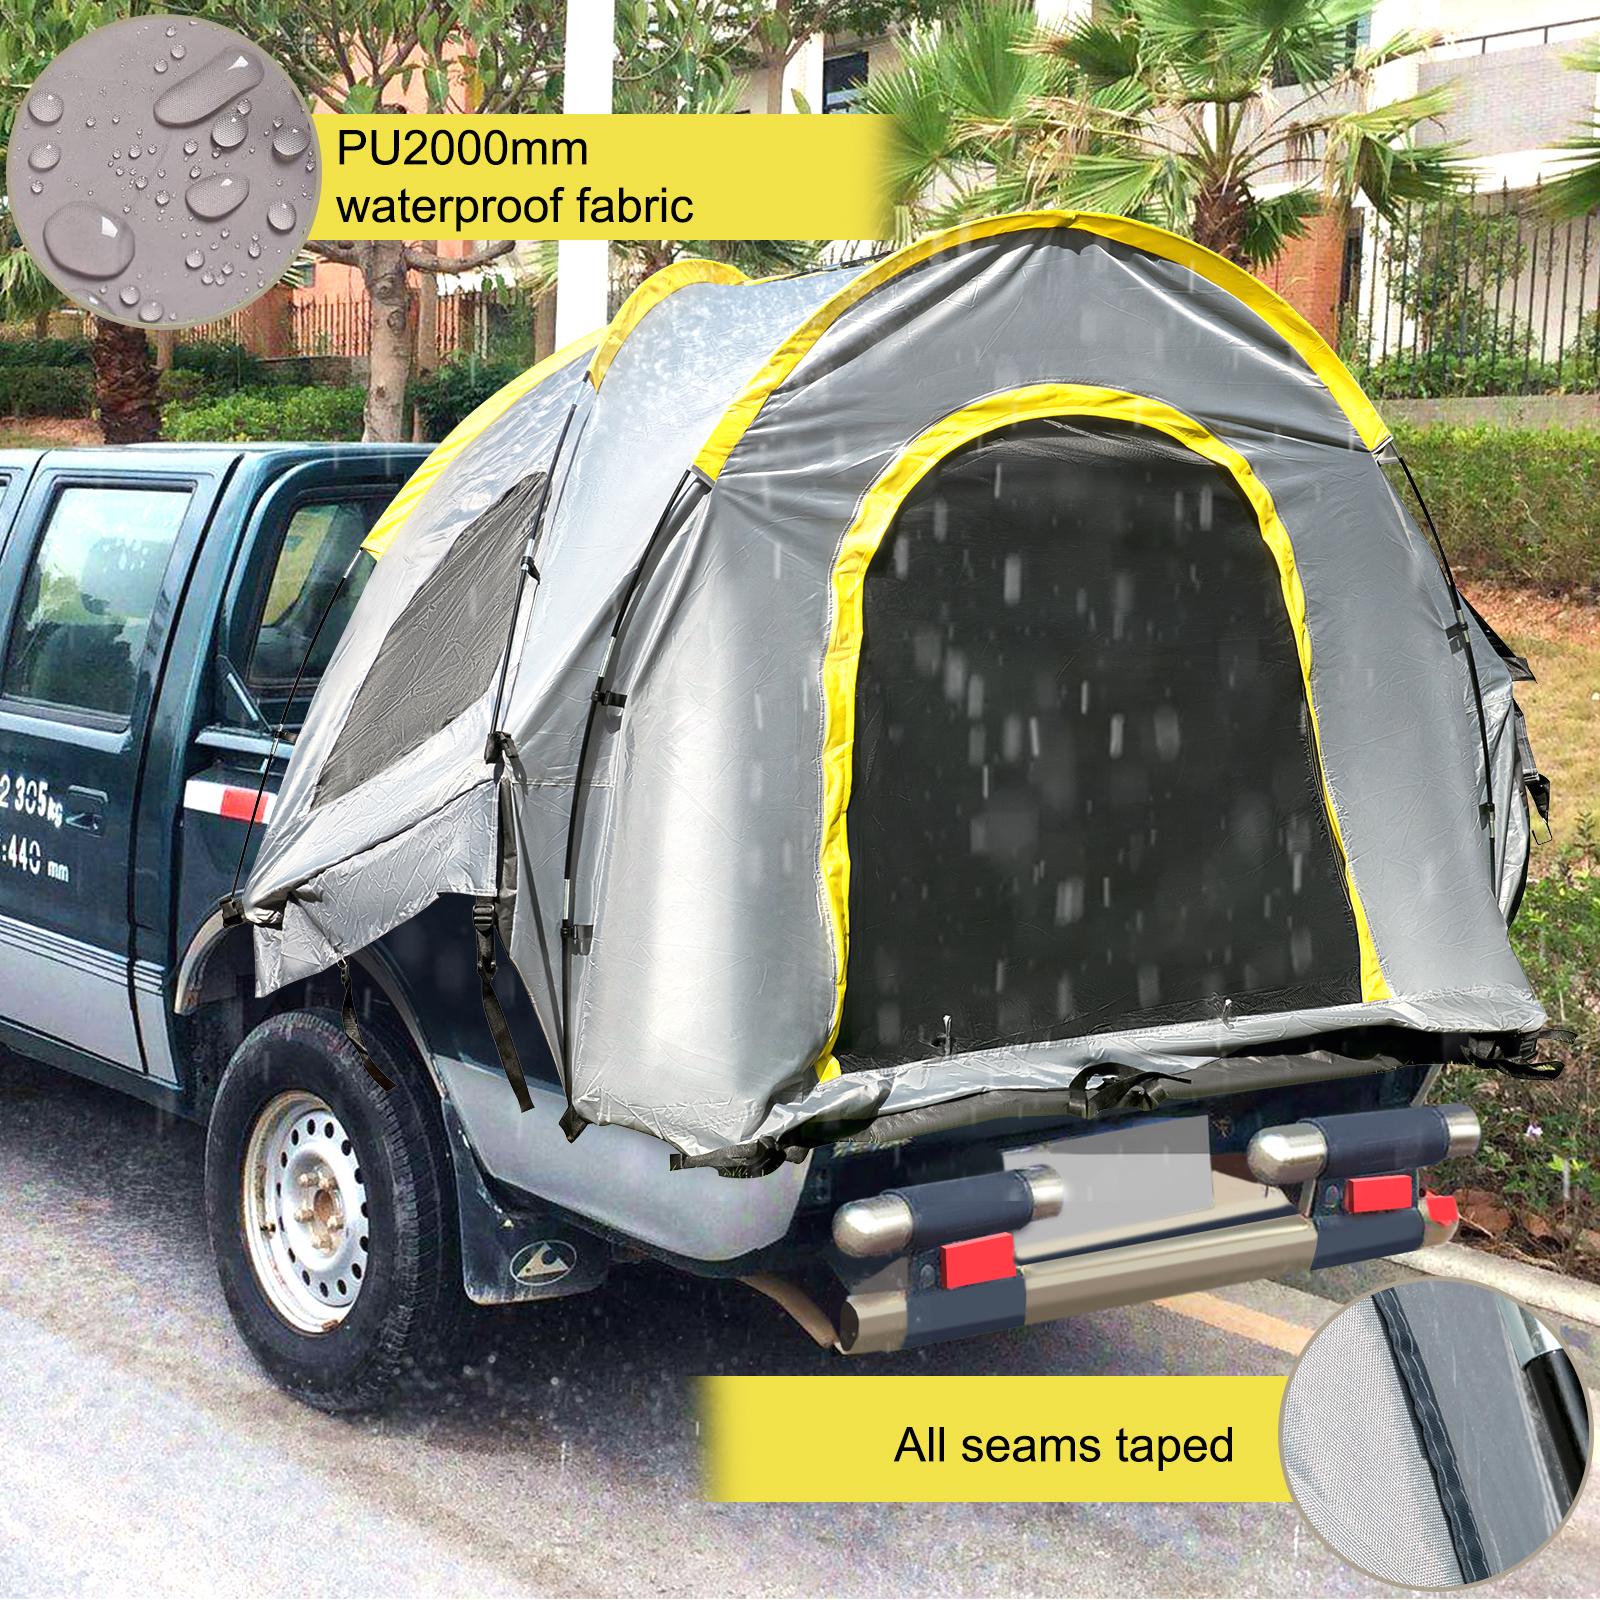 thumbnail 28 - VEVOR Truck Tent Truck Bed Tent 5' - 8' Pickup Tent Waterproof Outdoor Camping